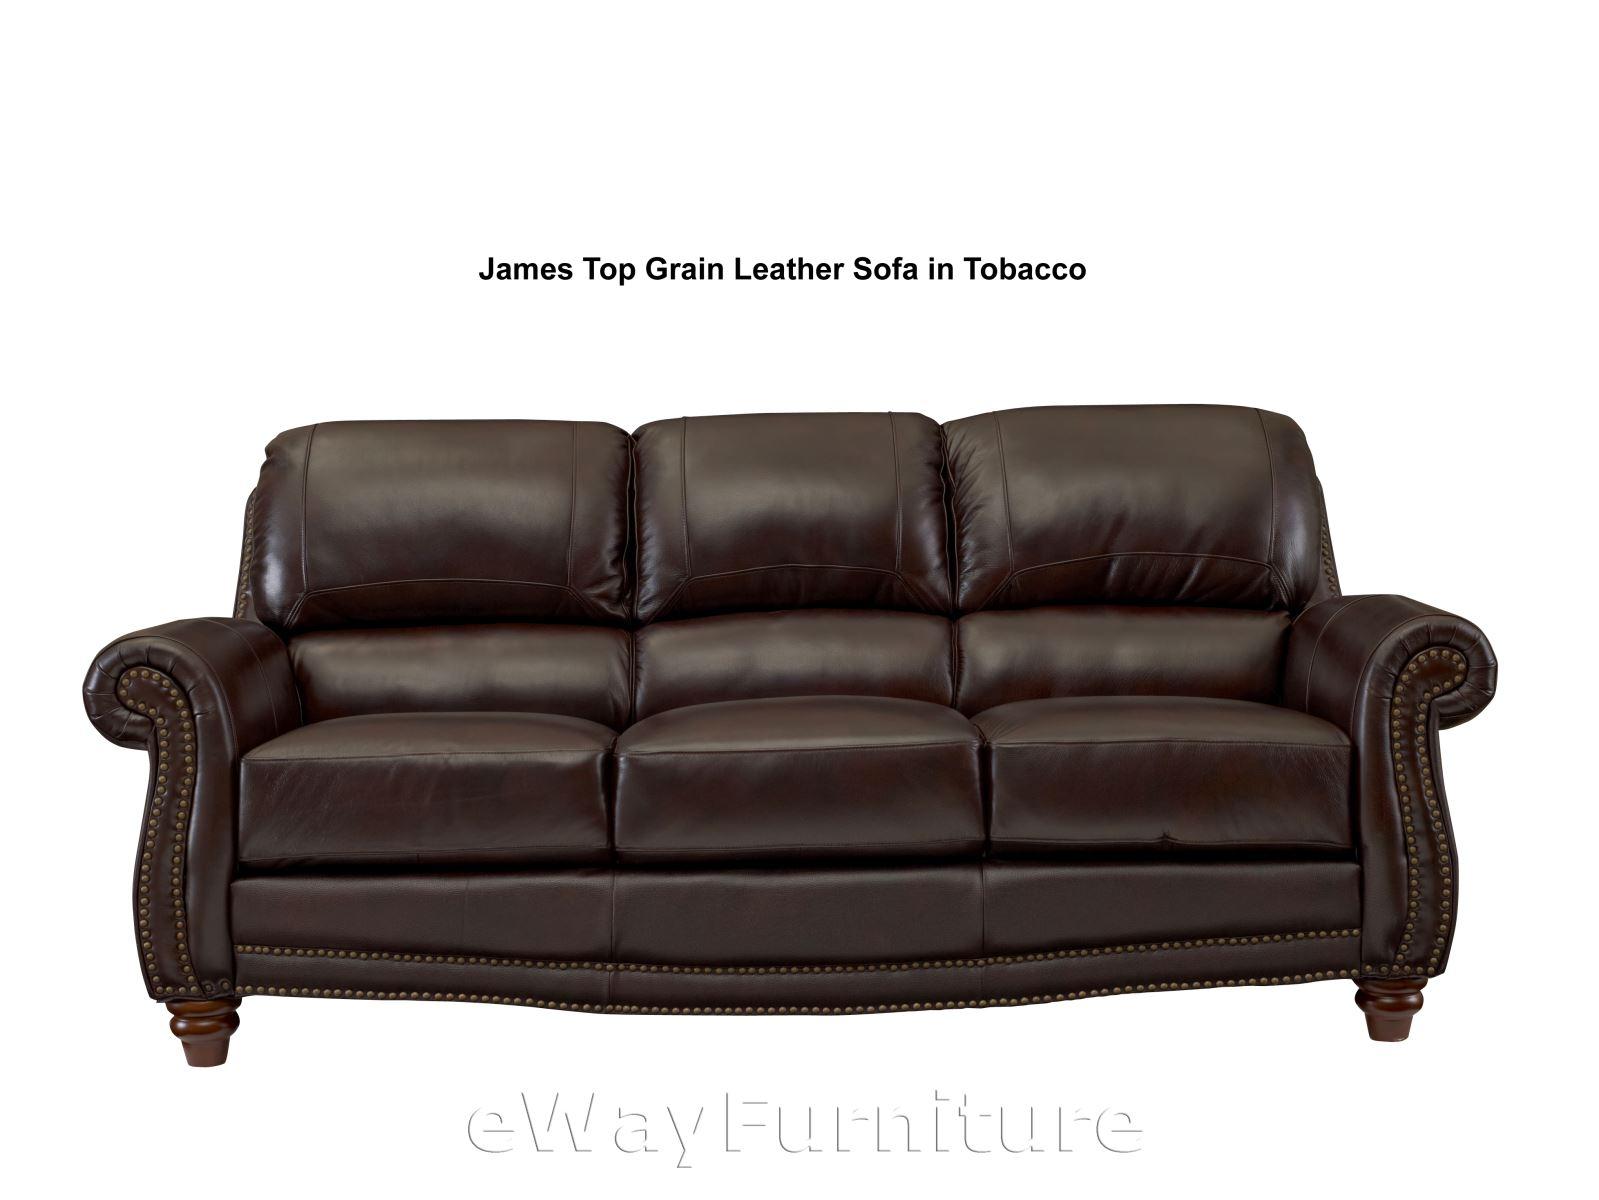 James Top Grain Leather Sofa in Tobacco